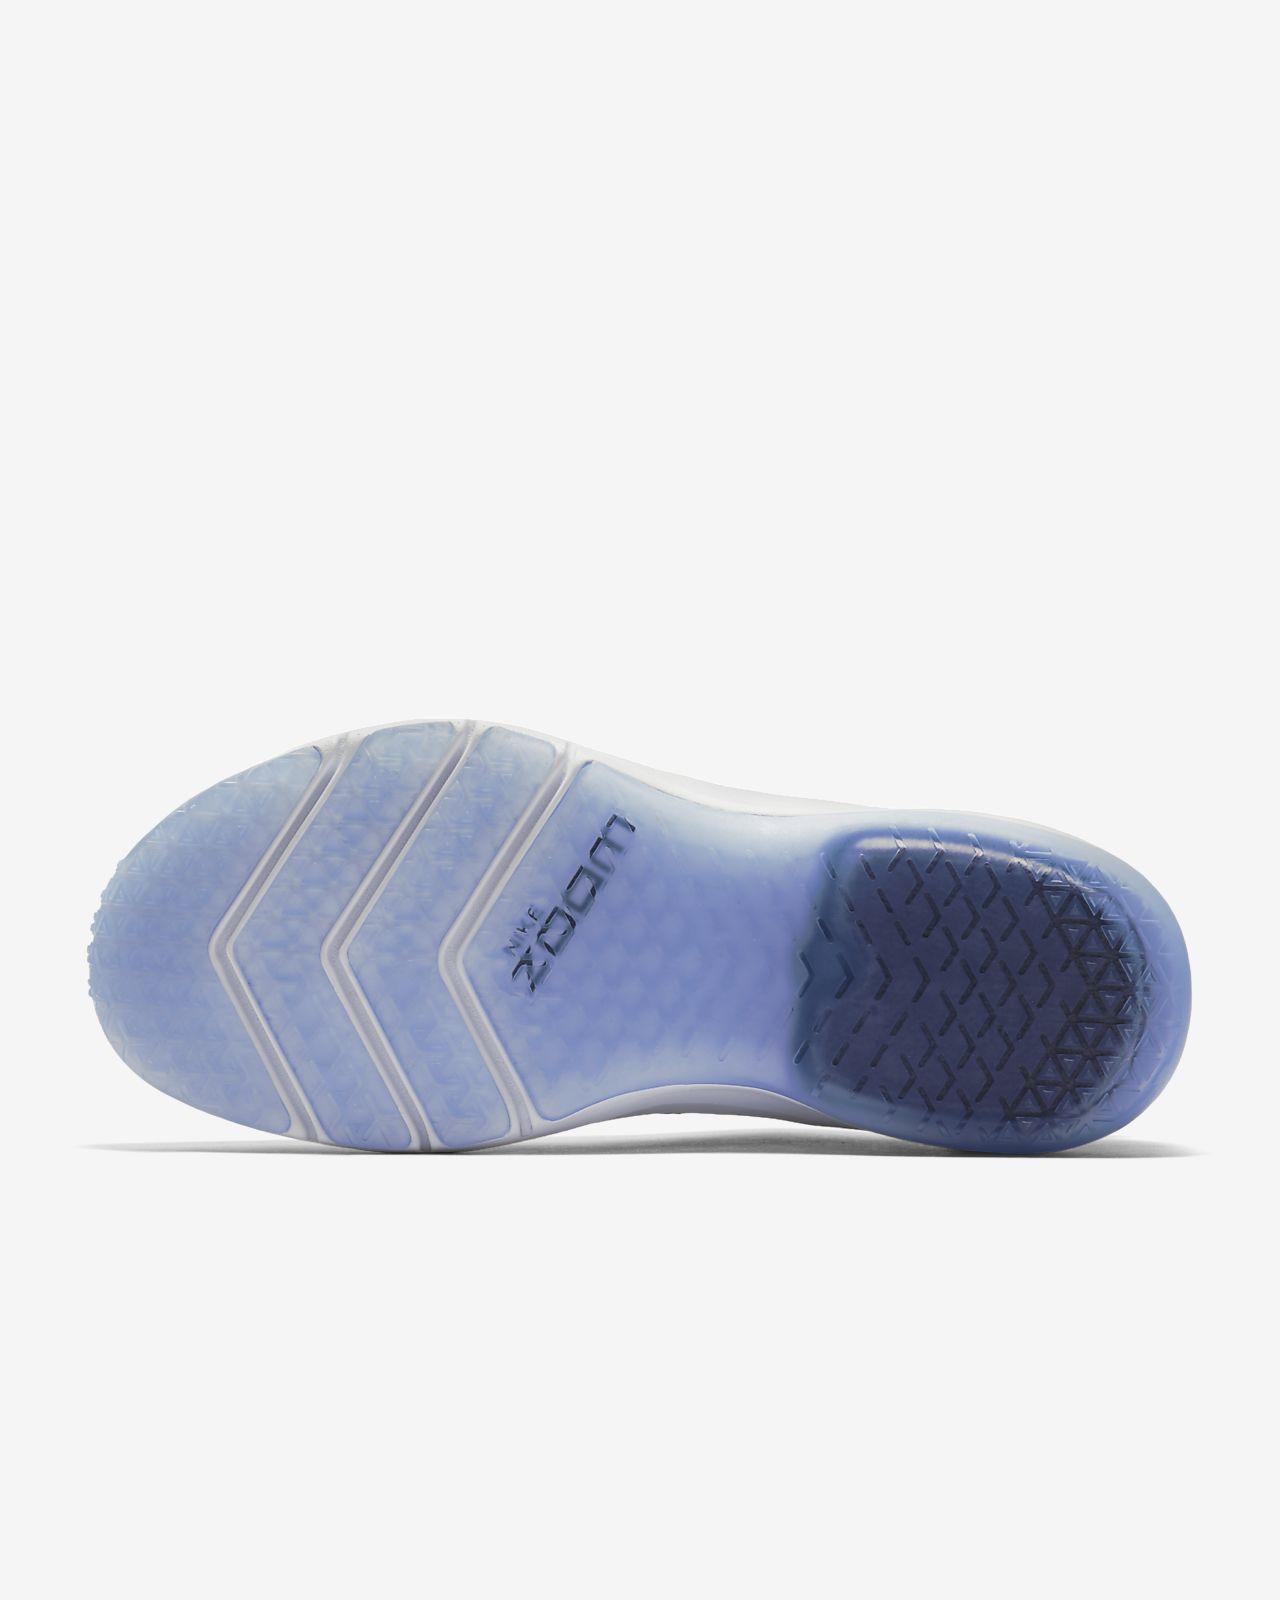 new concept d4071 c1176 ... Chaussure de training, boxe et fitness Nike Air Zoom Fearless Flyknit 2  pour Femme